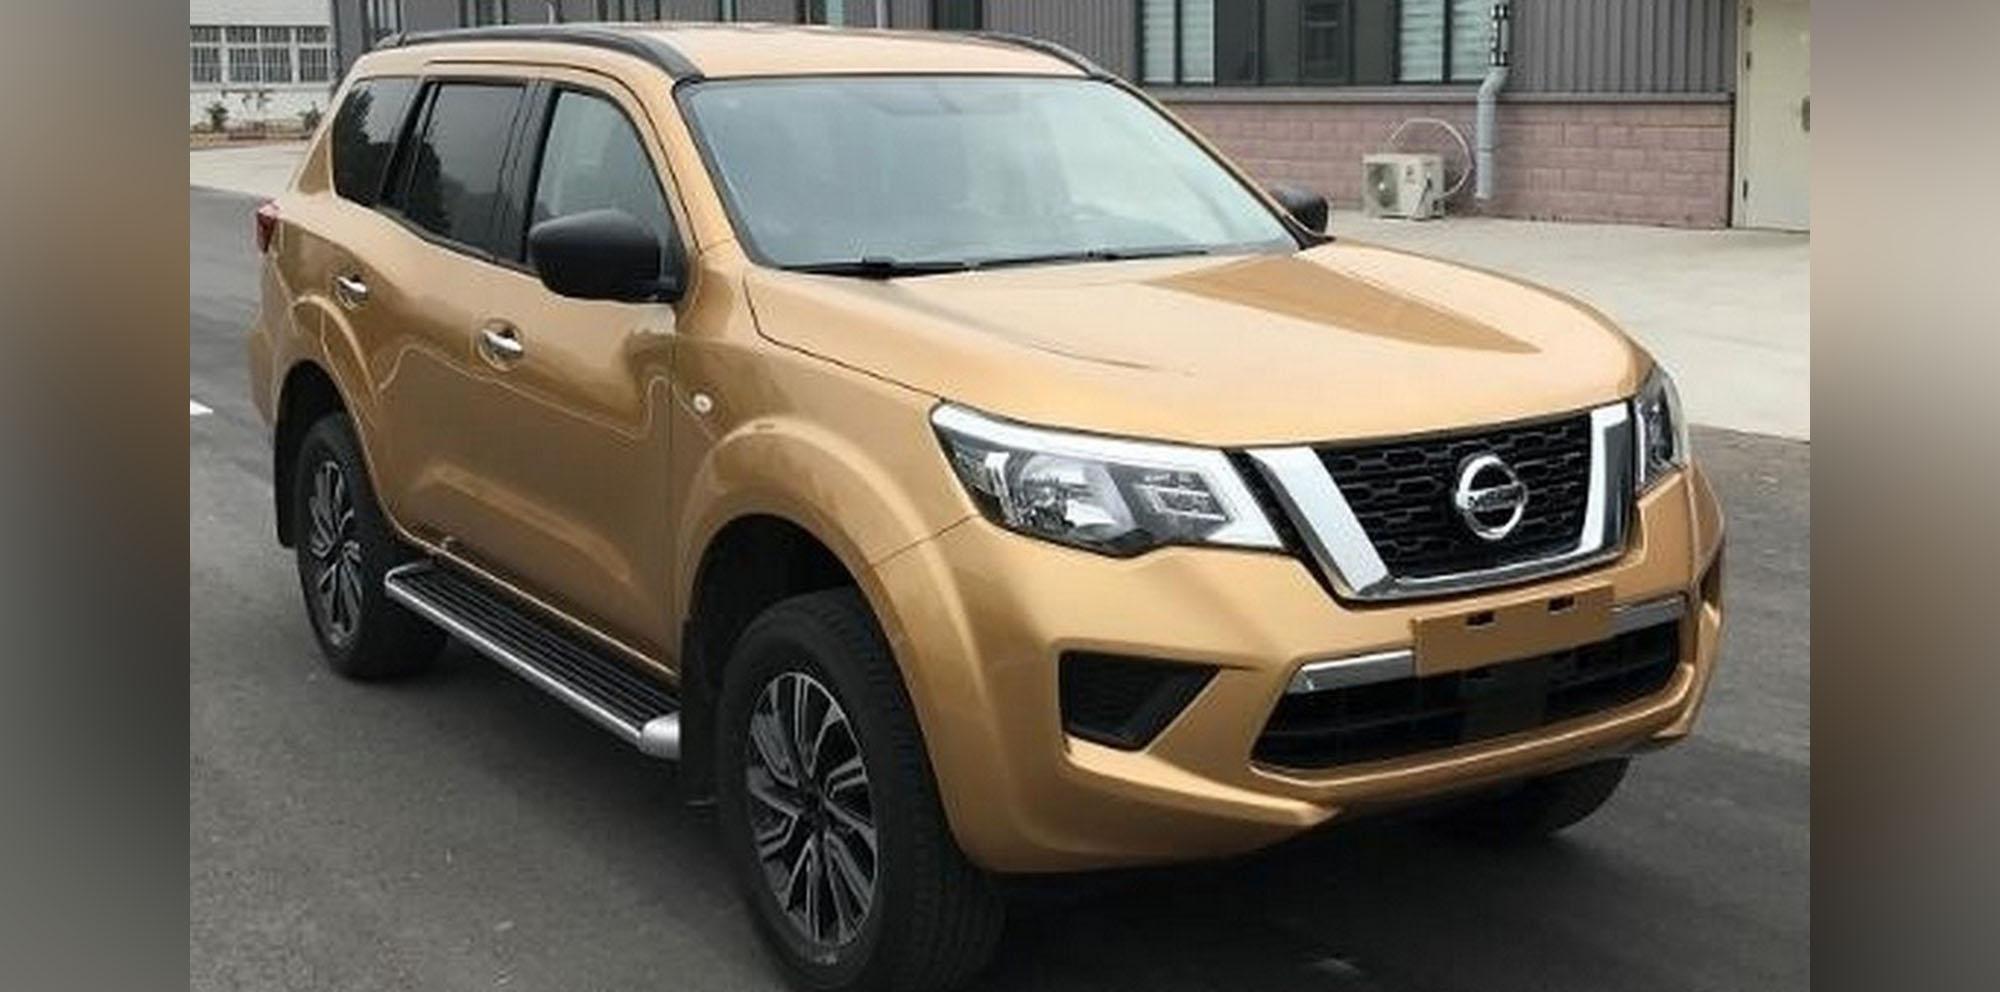 2018 Nissan Terra: Navara SUV leaked in China - Photos